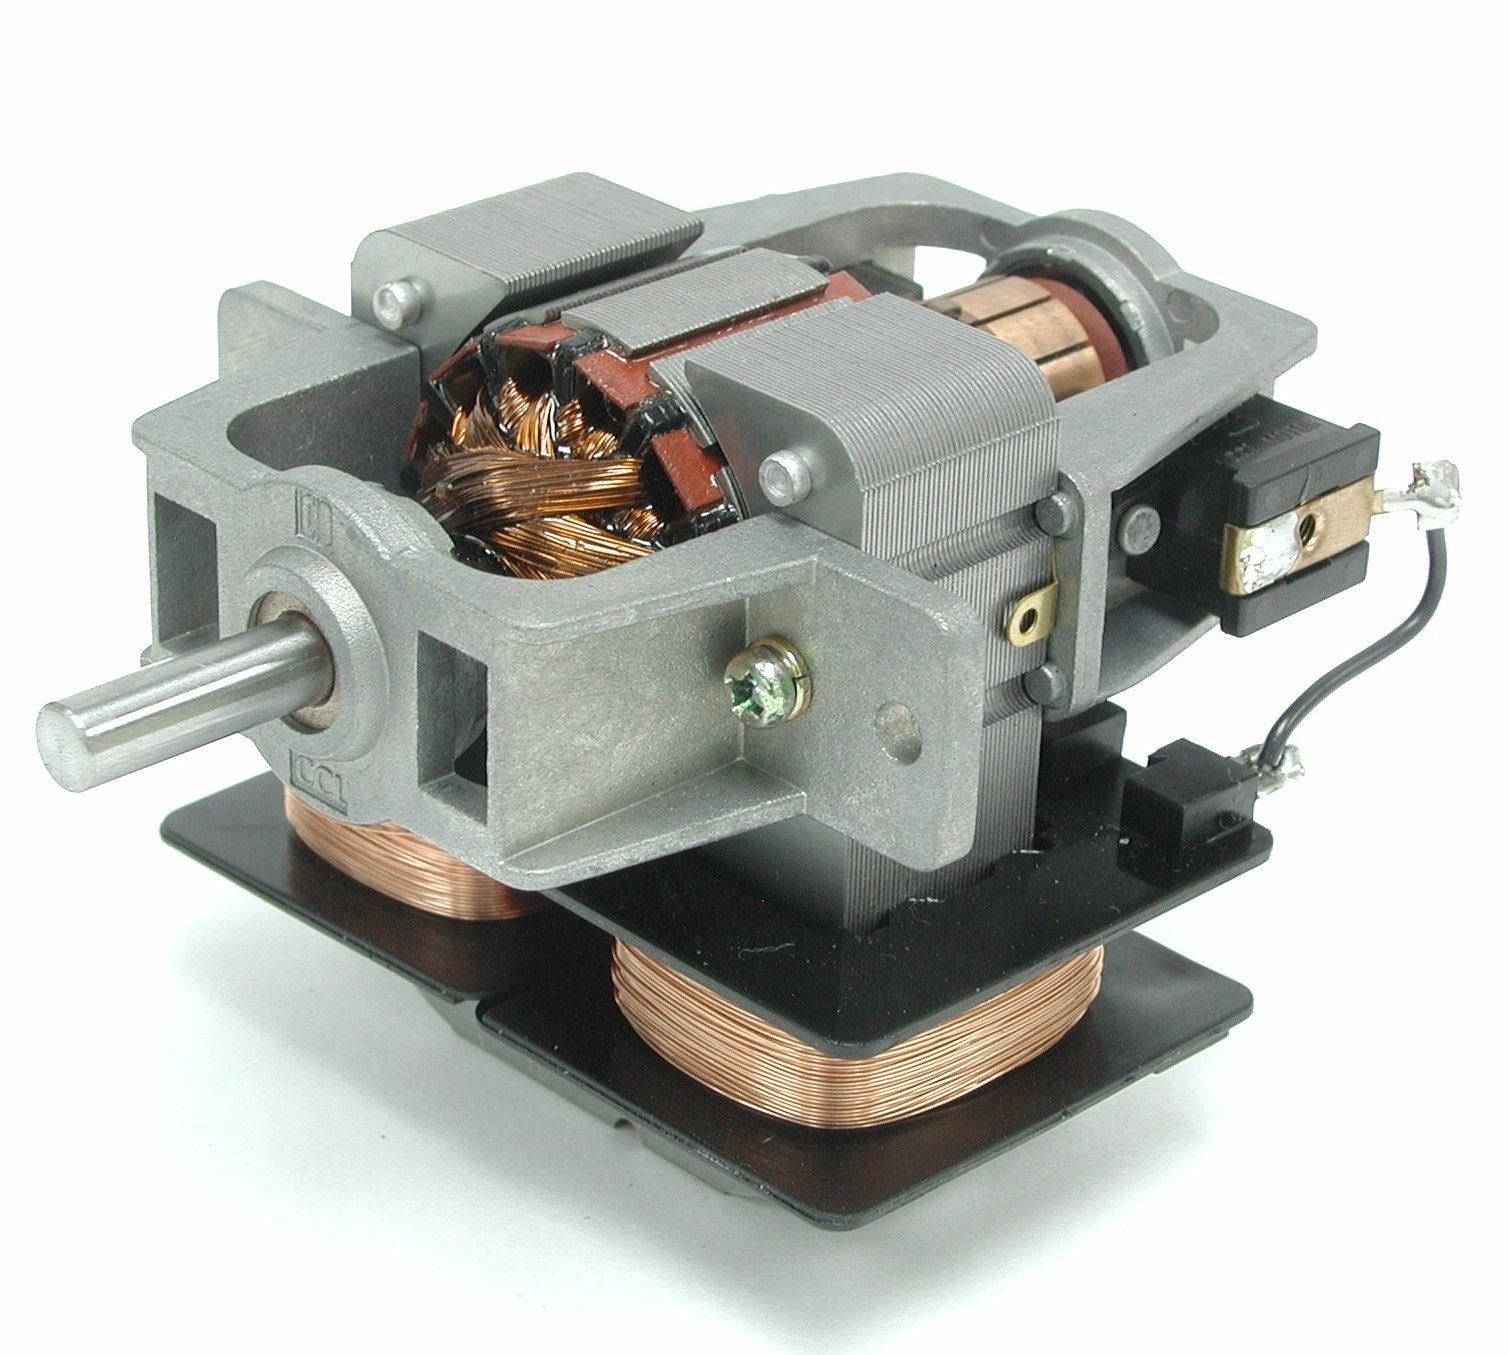 Series Wound DC Motor or DC Series Motor